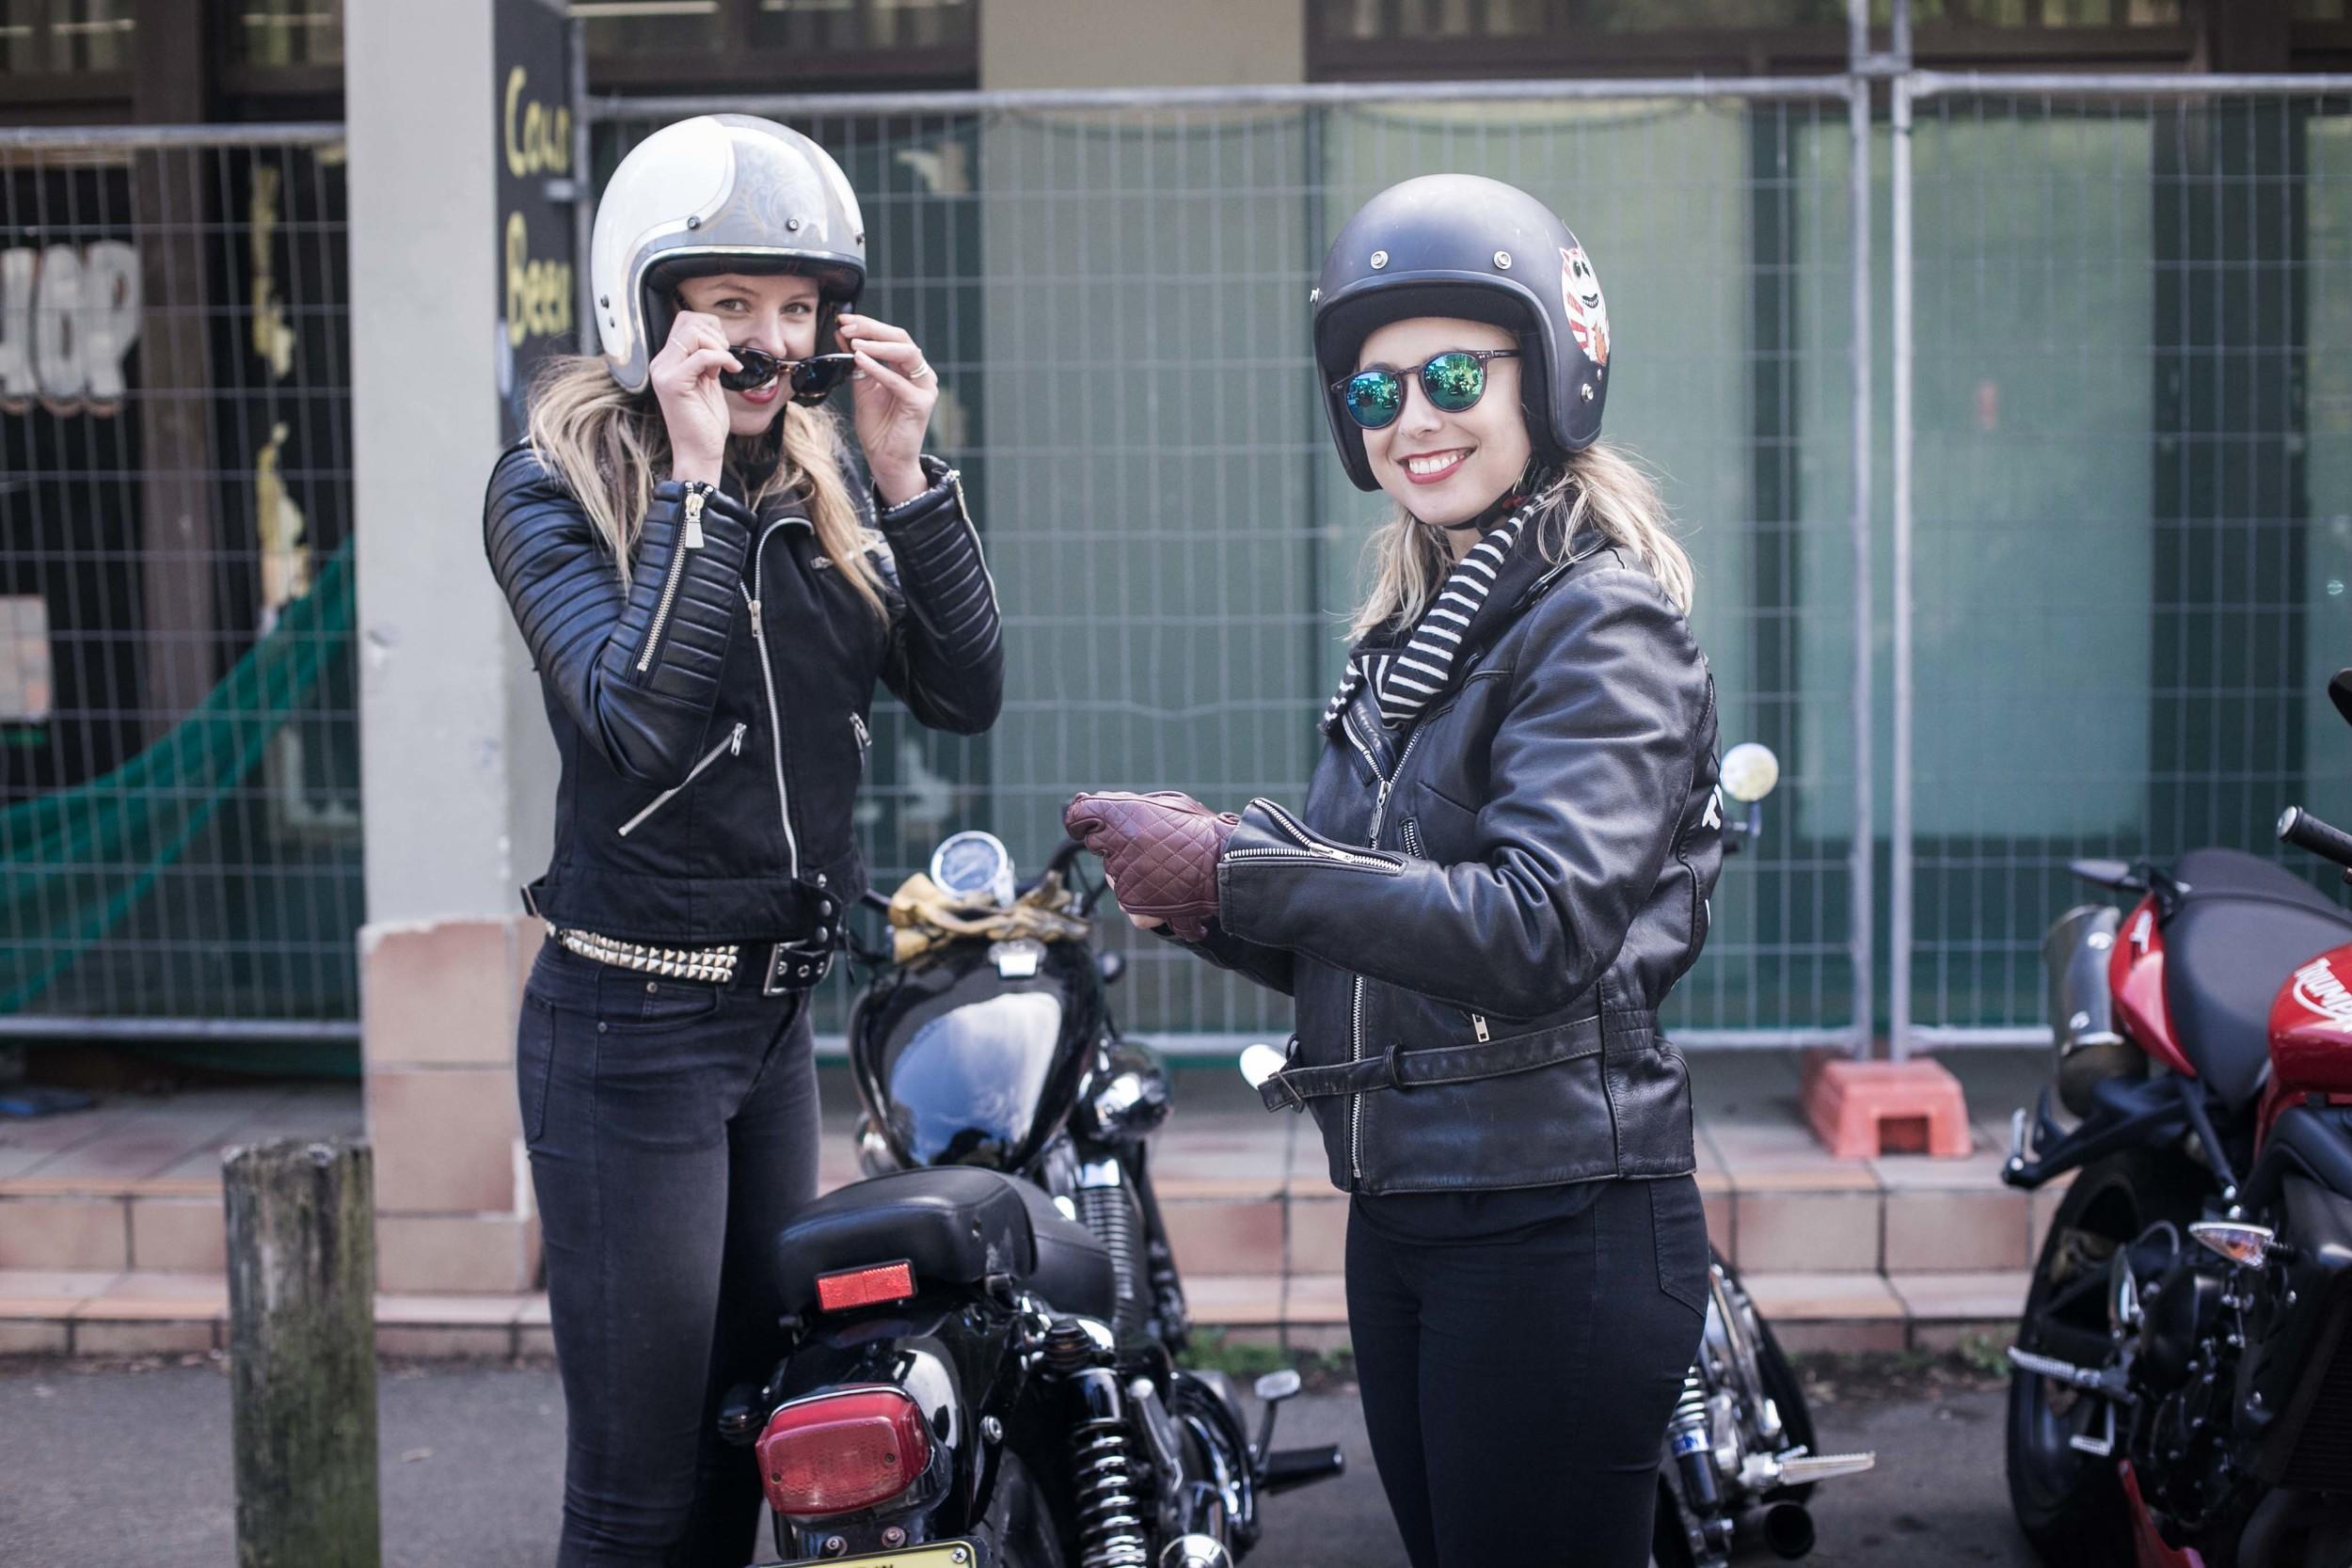 in_venus_Veritas_dolls_ride_erica_nina-1.jpg